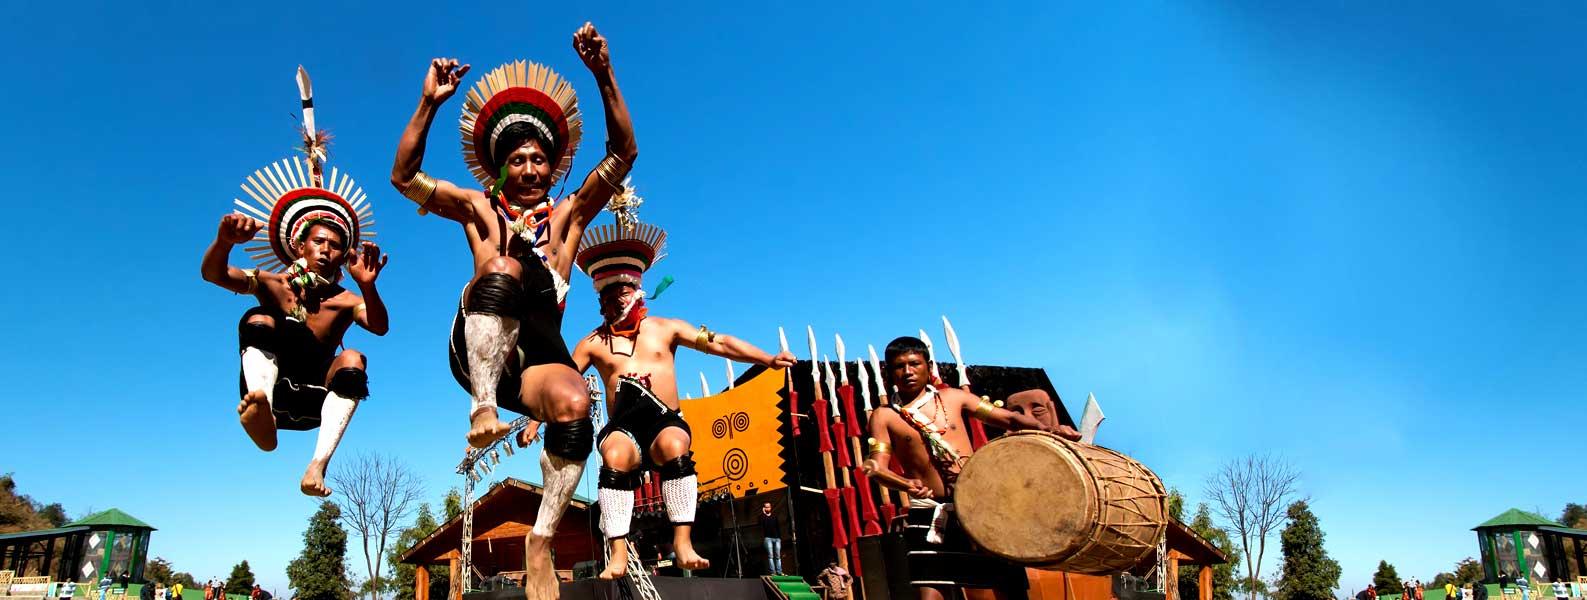 Hornbill Festival backpacking trip – Nagaland